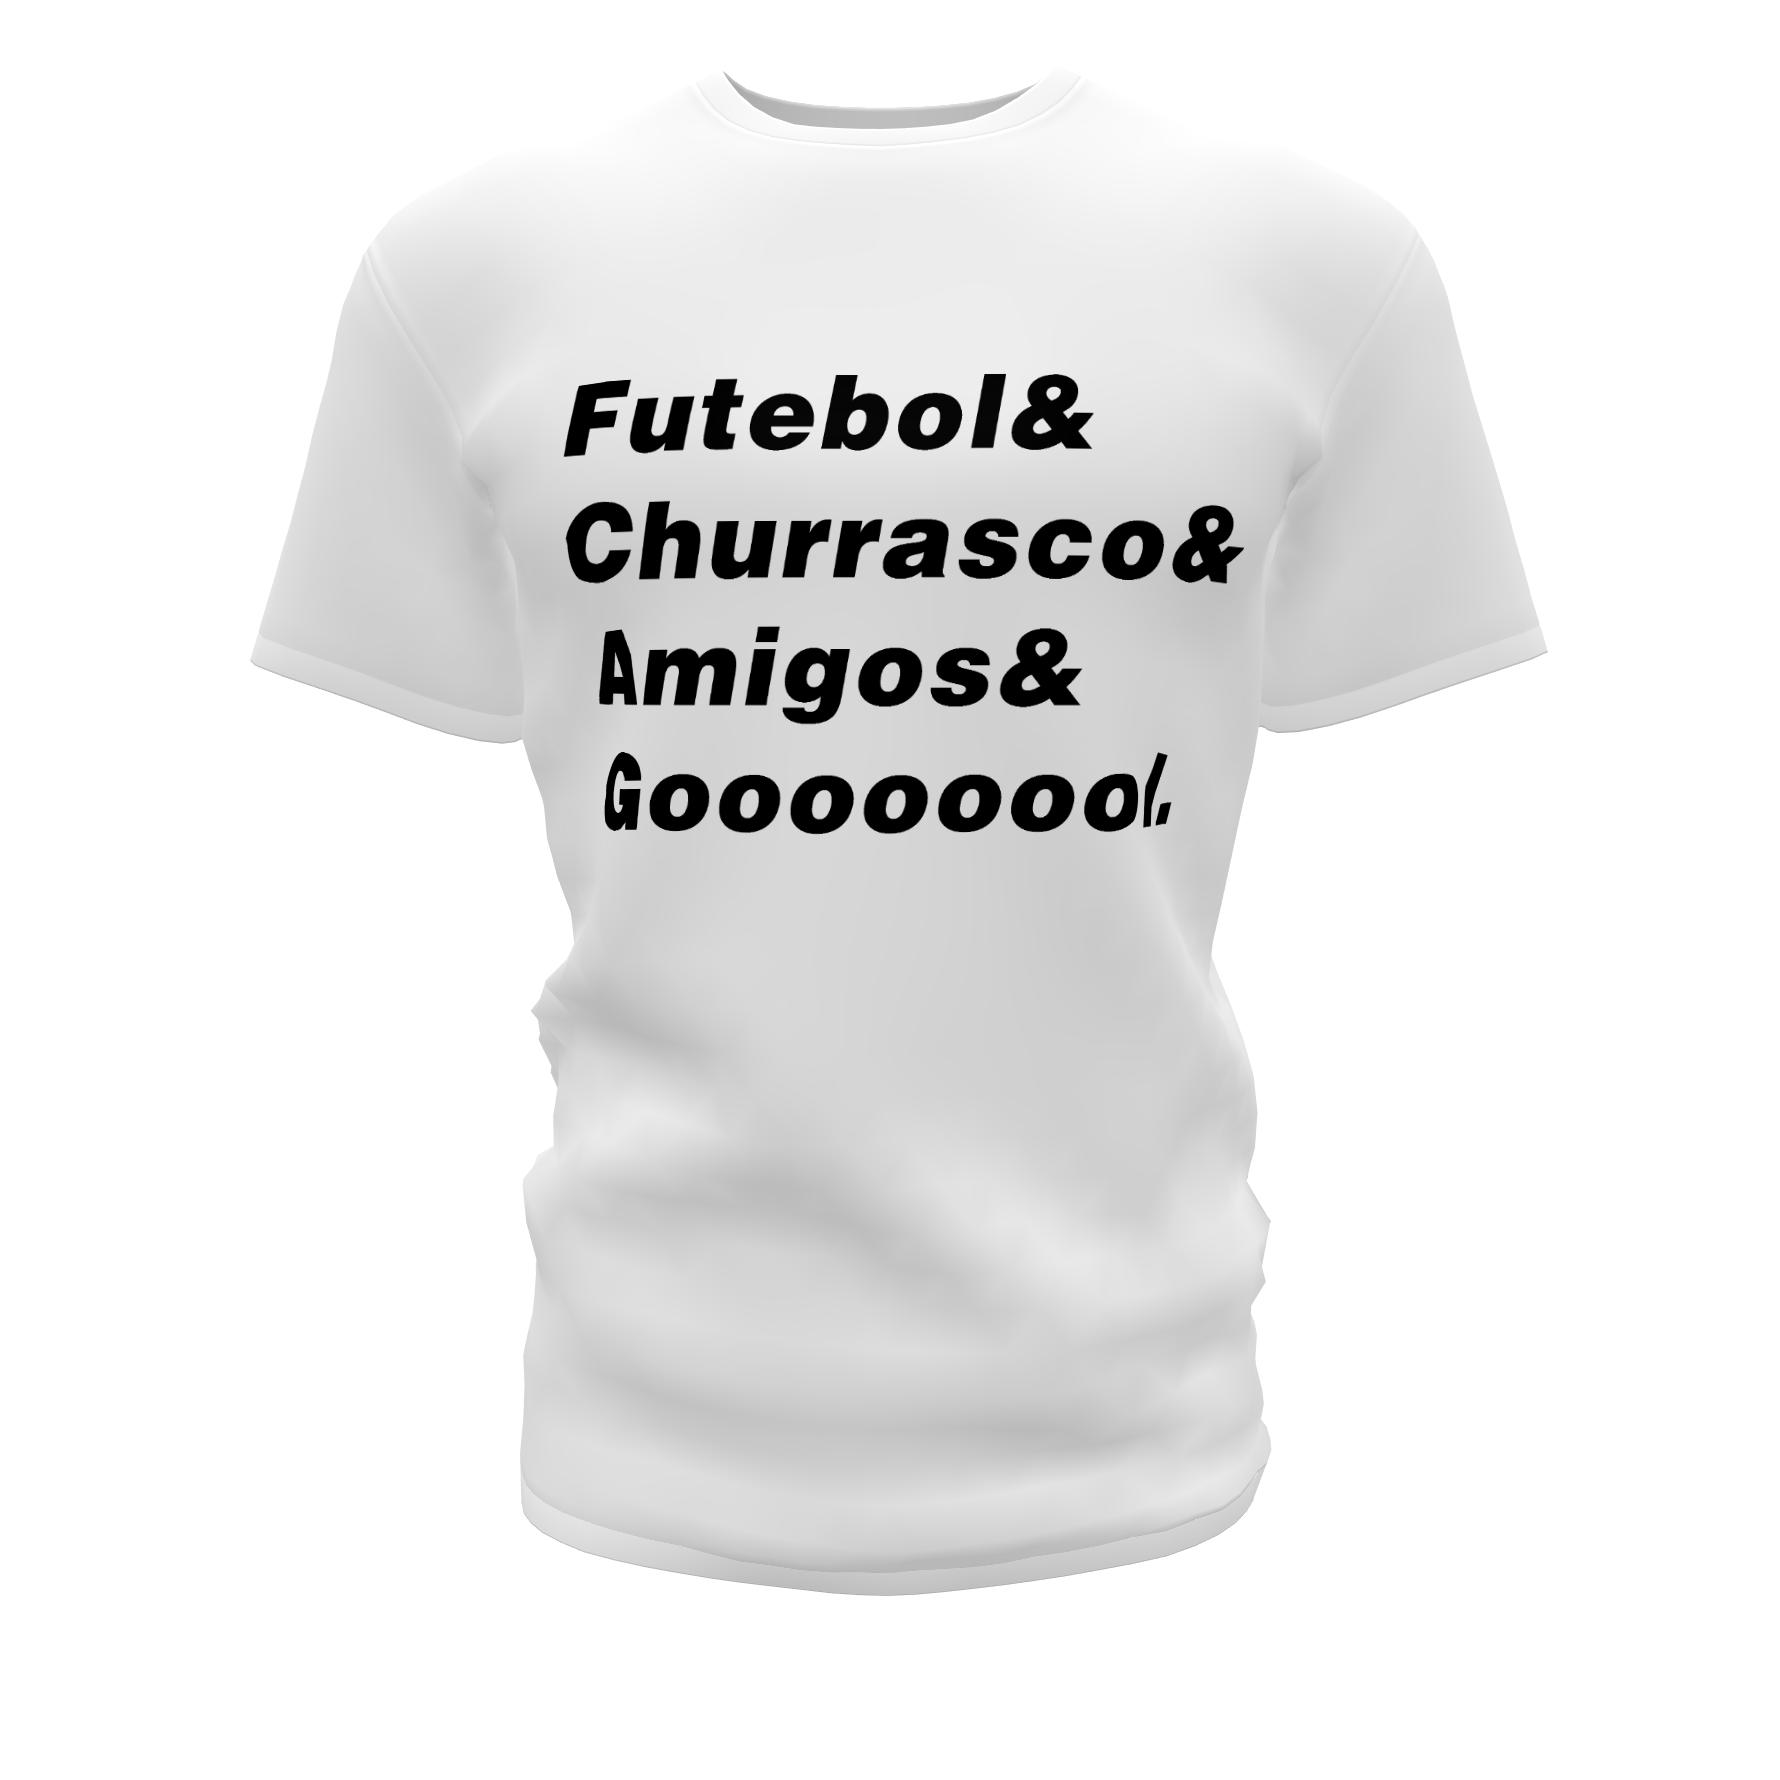 Camisetas Masculinas Personalizadas